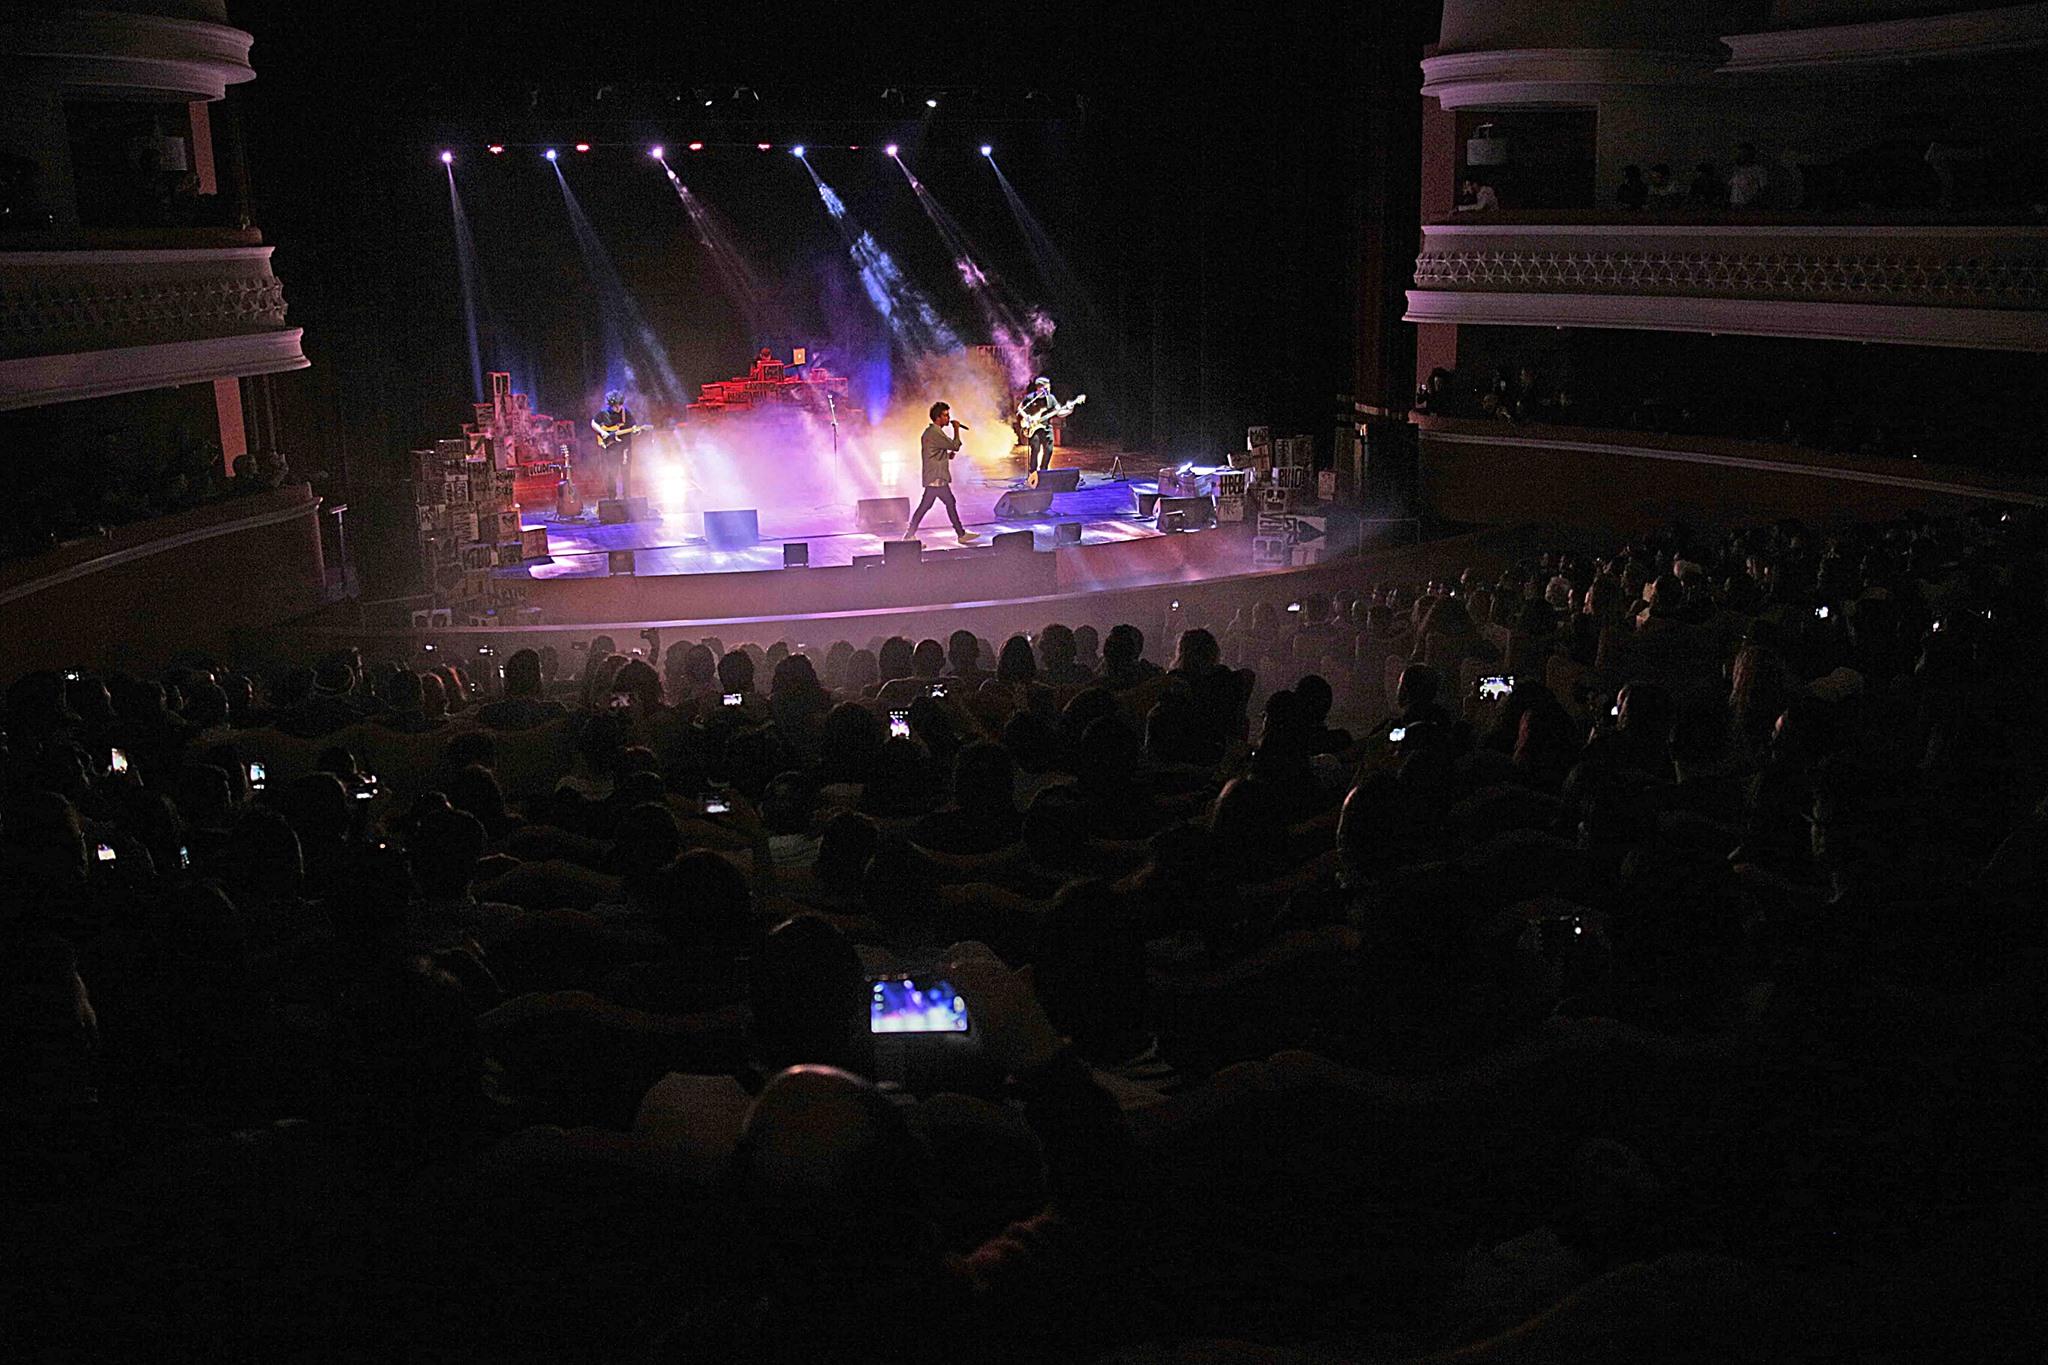 Eman teatro